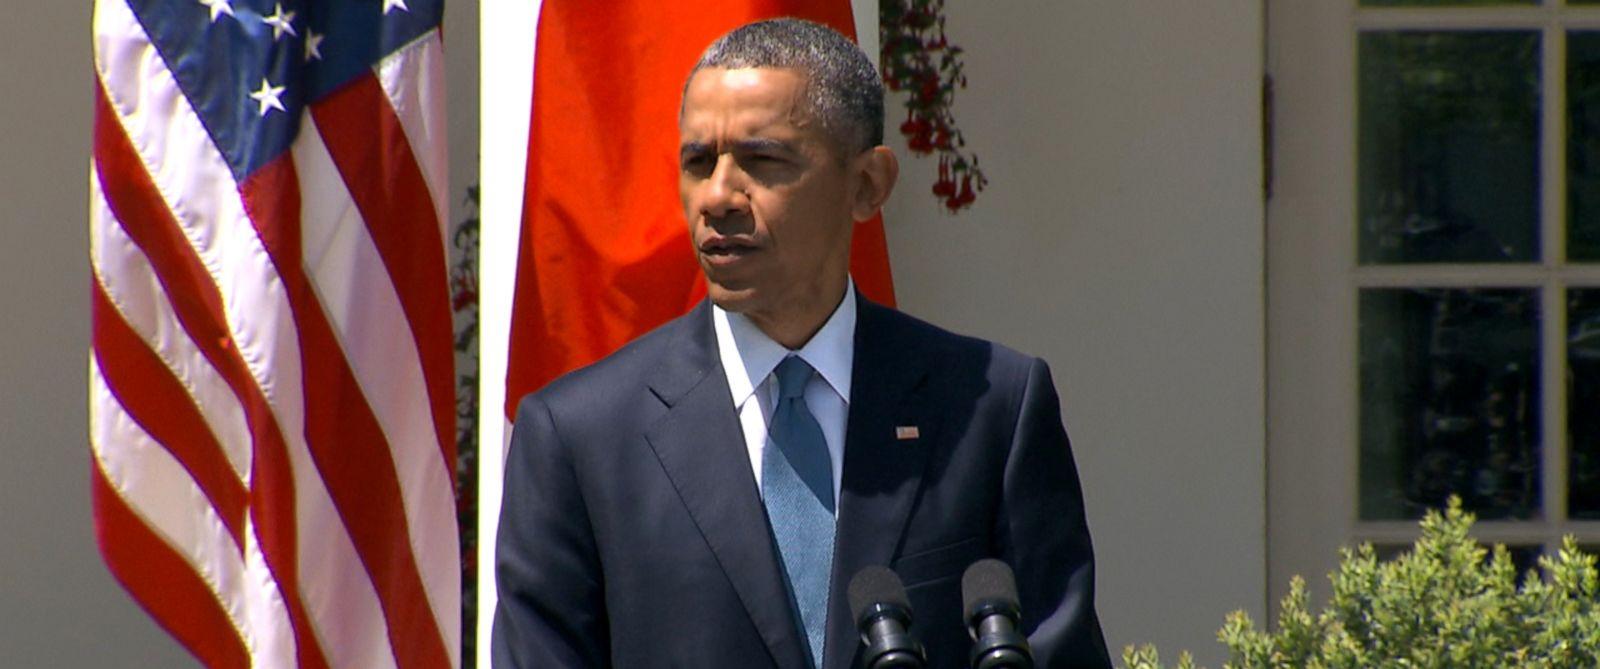 PHOTO: President Barack Obama speaks in the Rose Garden at the White House in Washington, April 28, 2015.